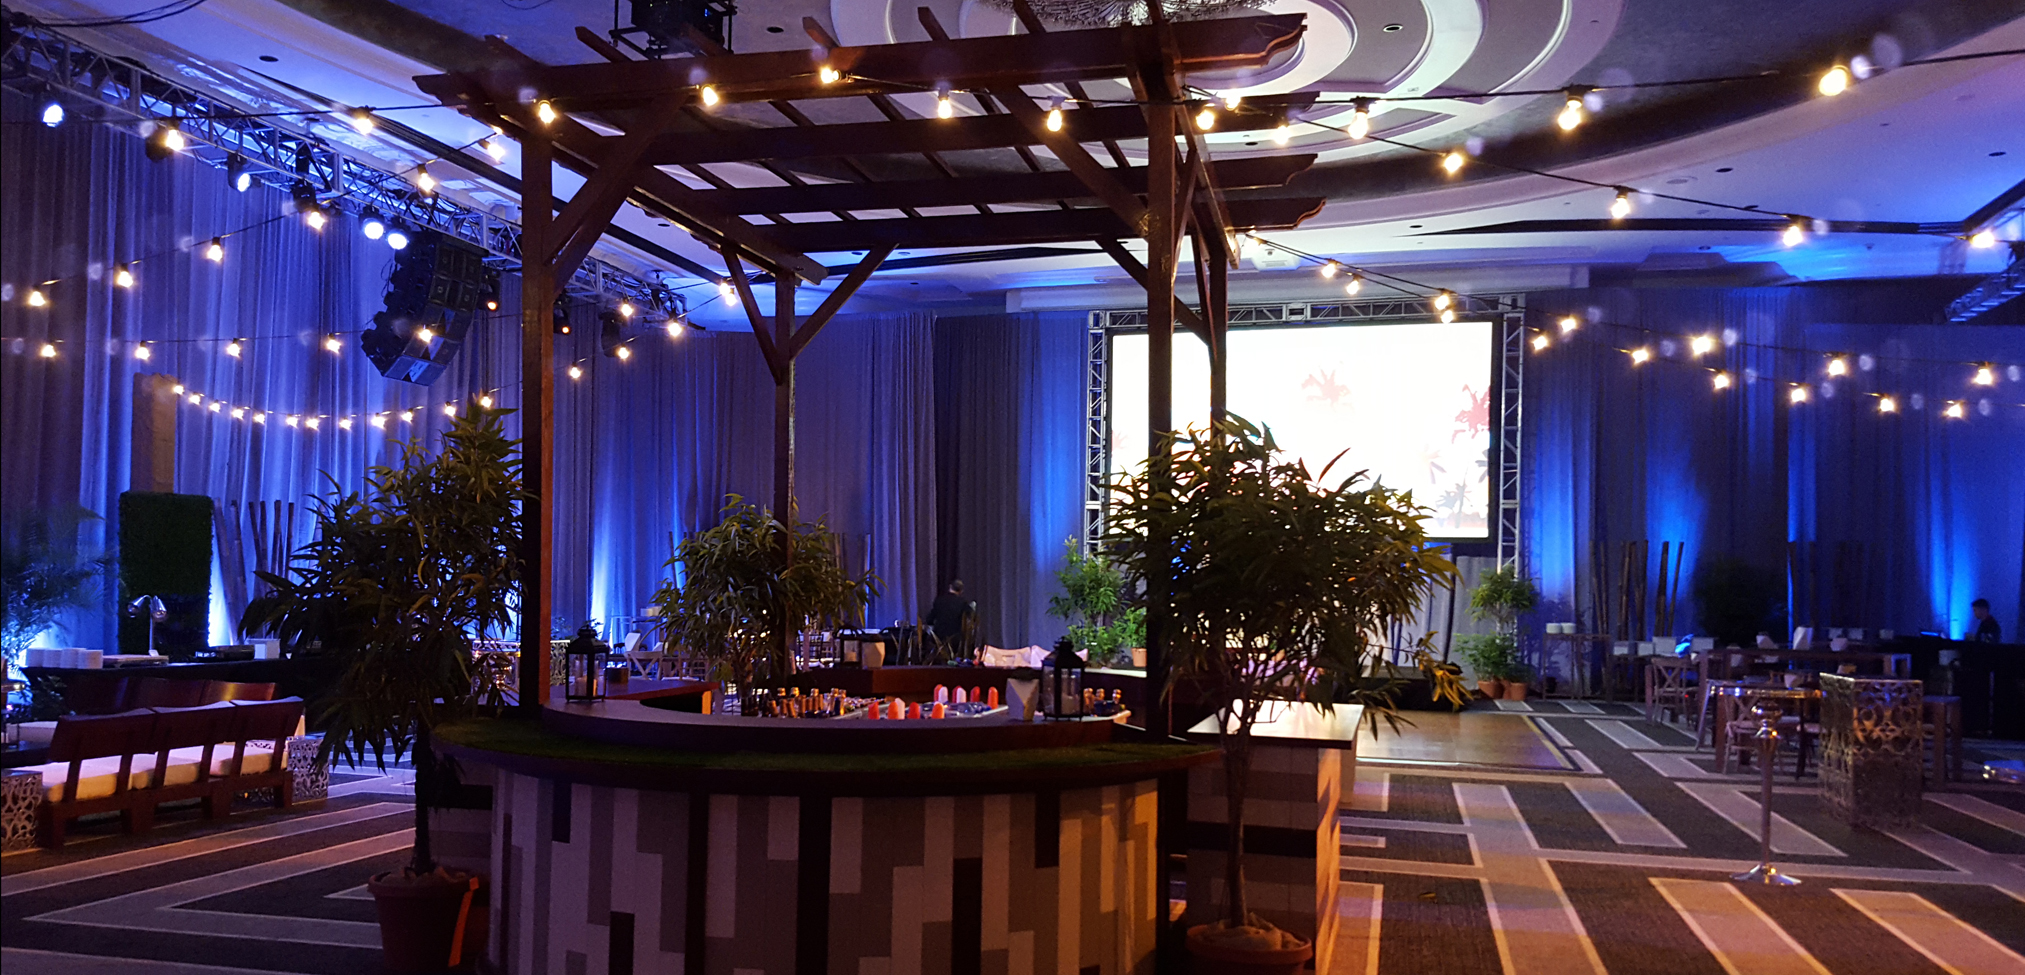 Urban Garden at Loews Miami Beach Hotel - So Cool Events, Inc.